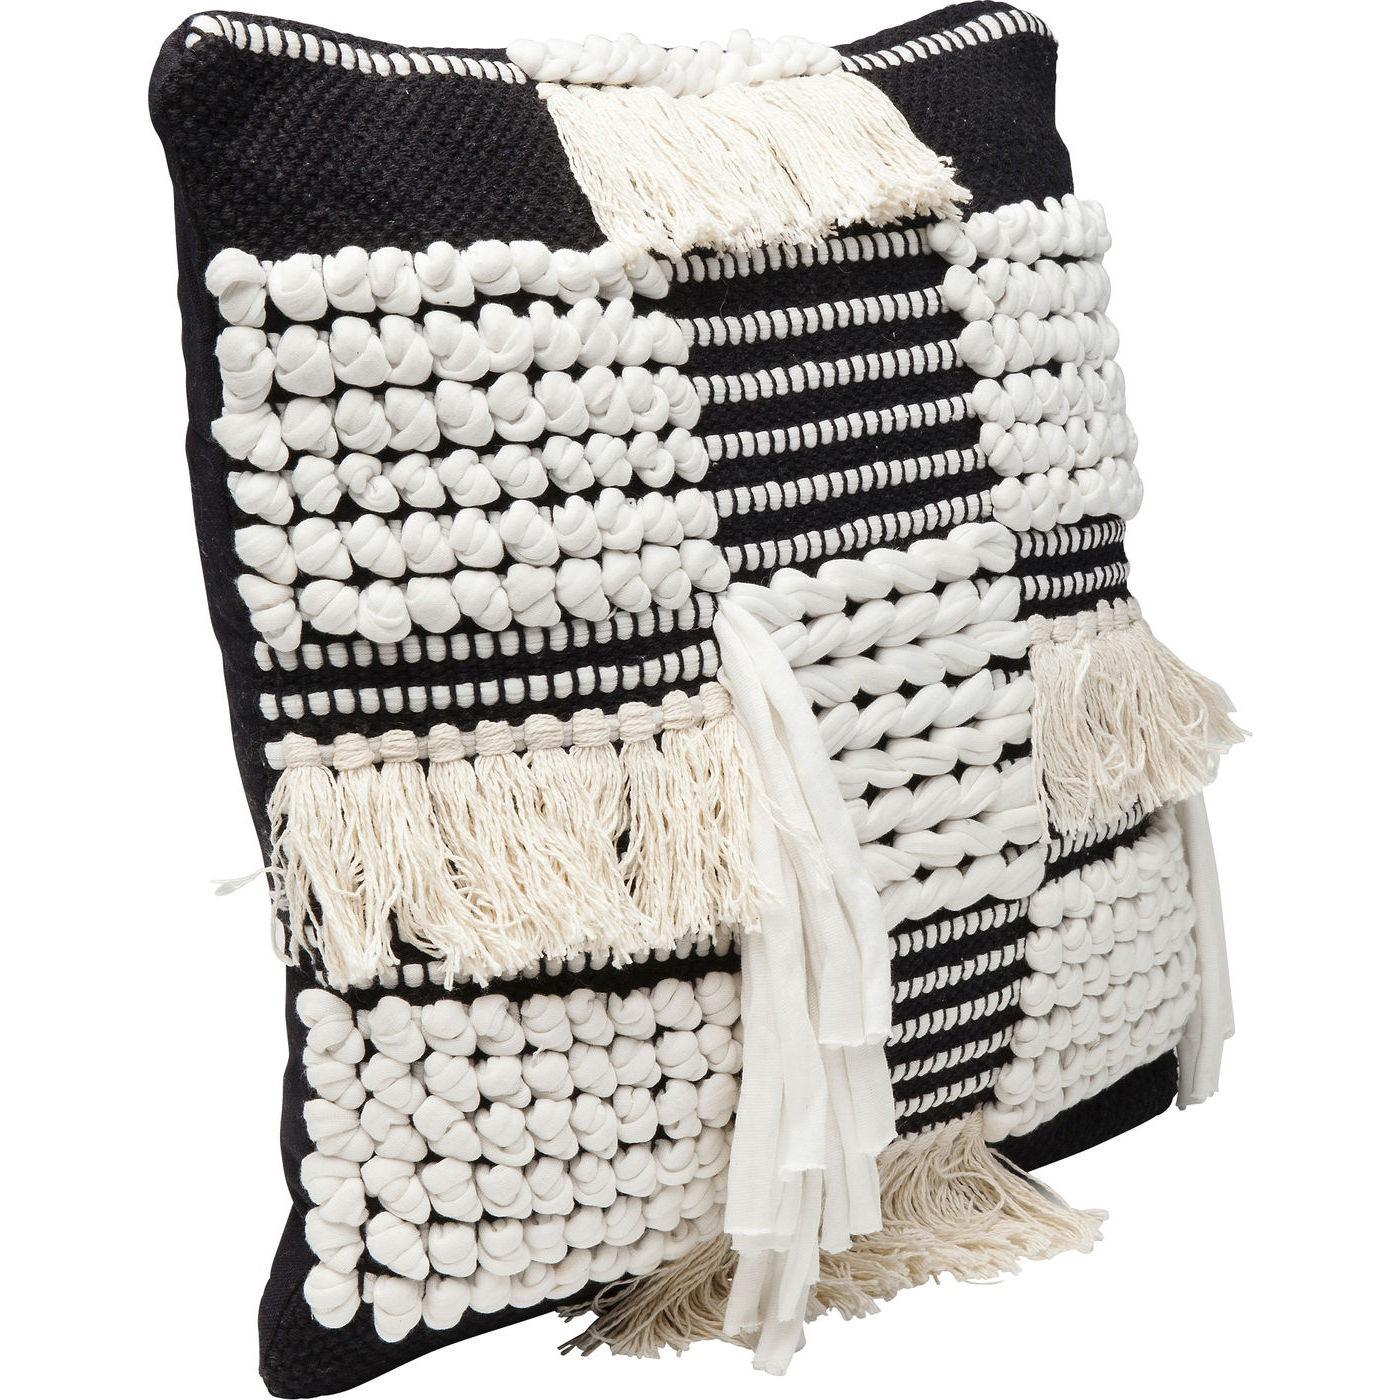 Coussin Husky noir et blanc 45x45cm Kare Design